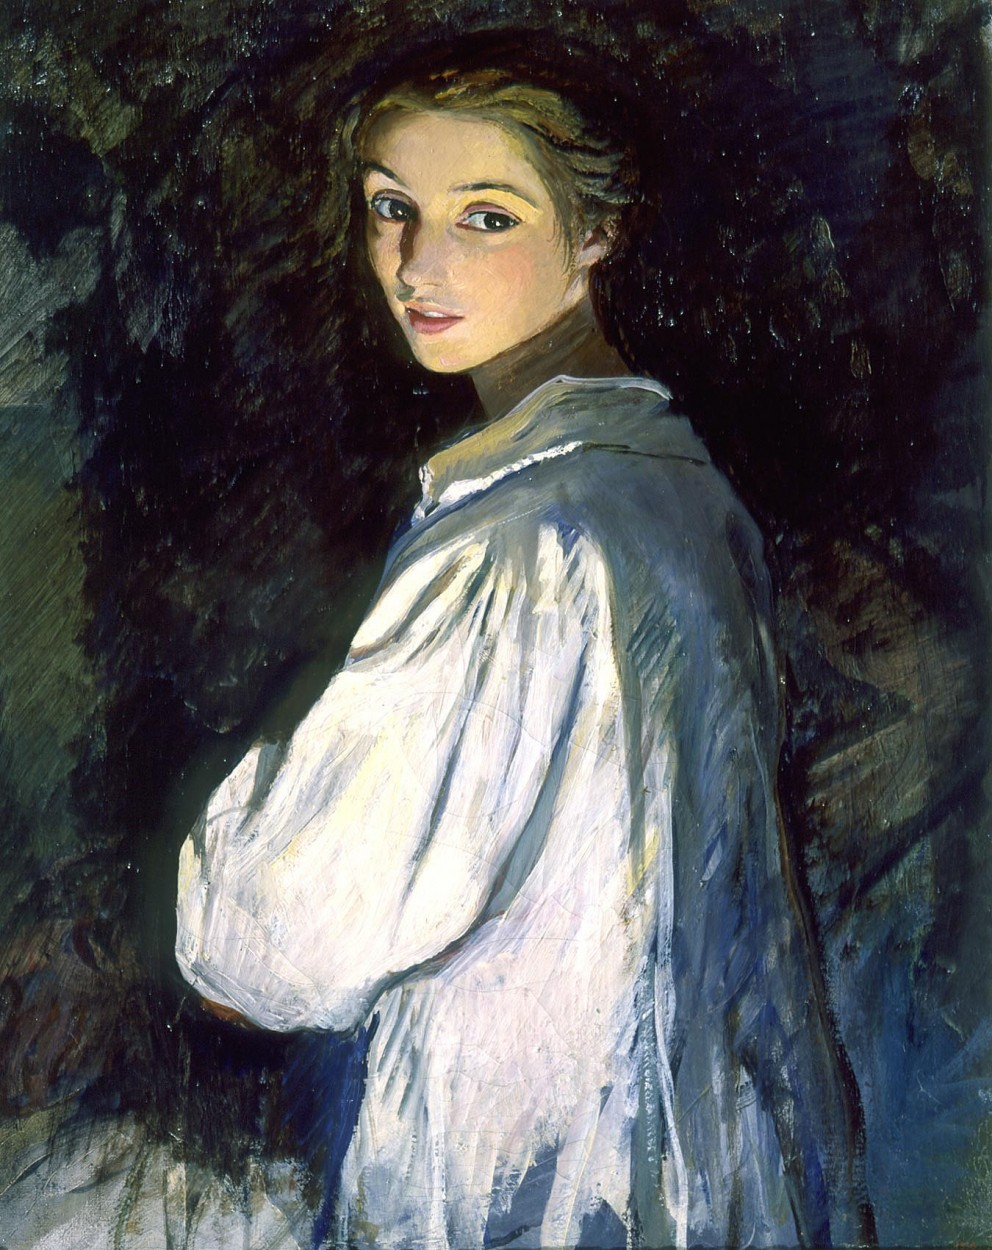 Girl with a Candle by Zinaida Serebriakova via DailyArt app, your daily dose of art getdailyart.com